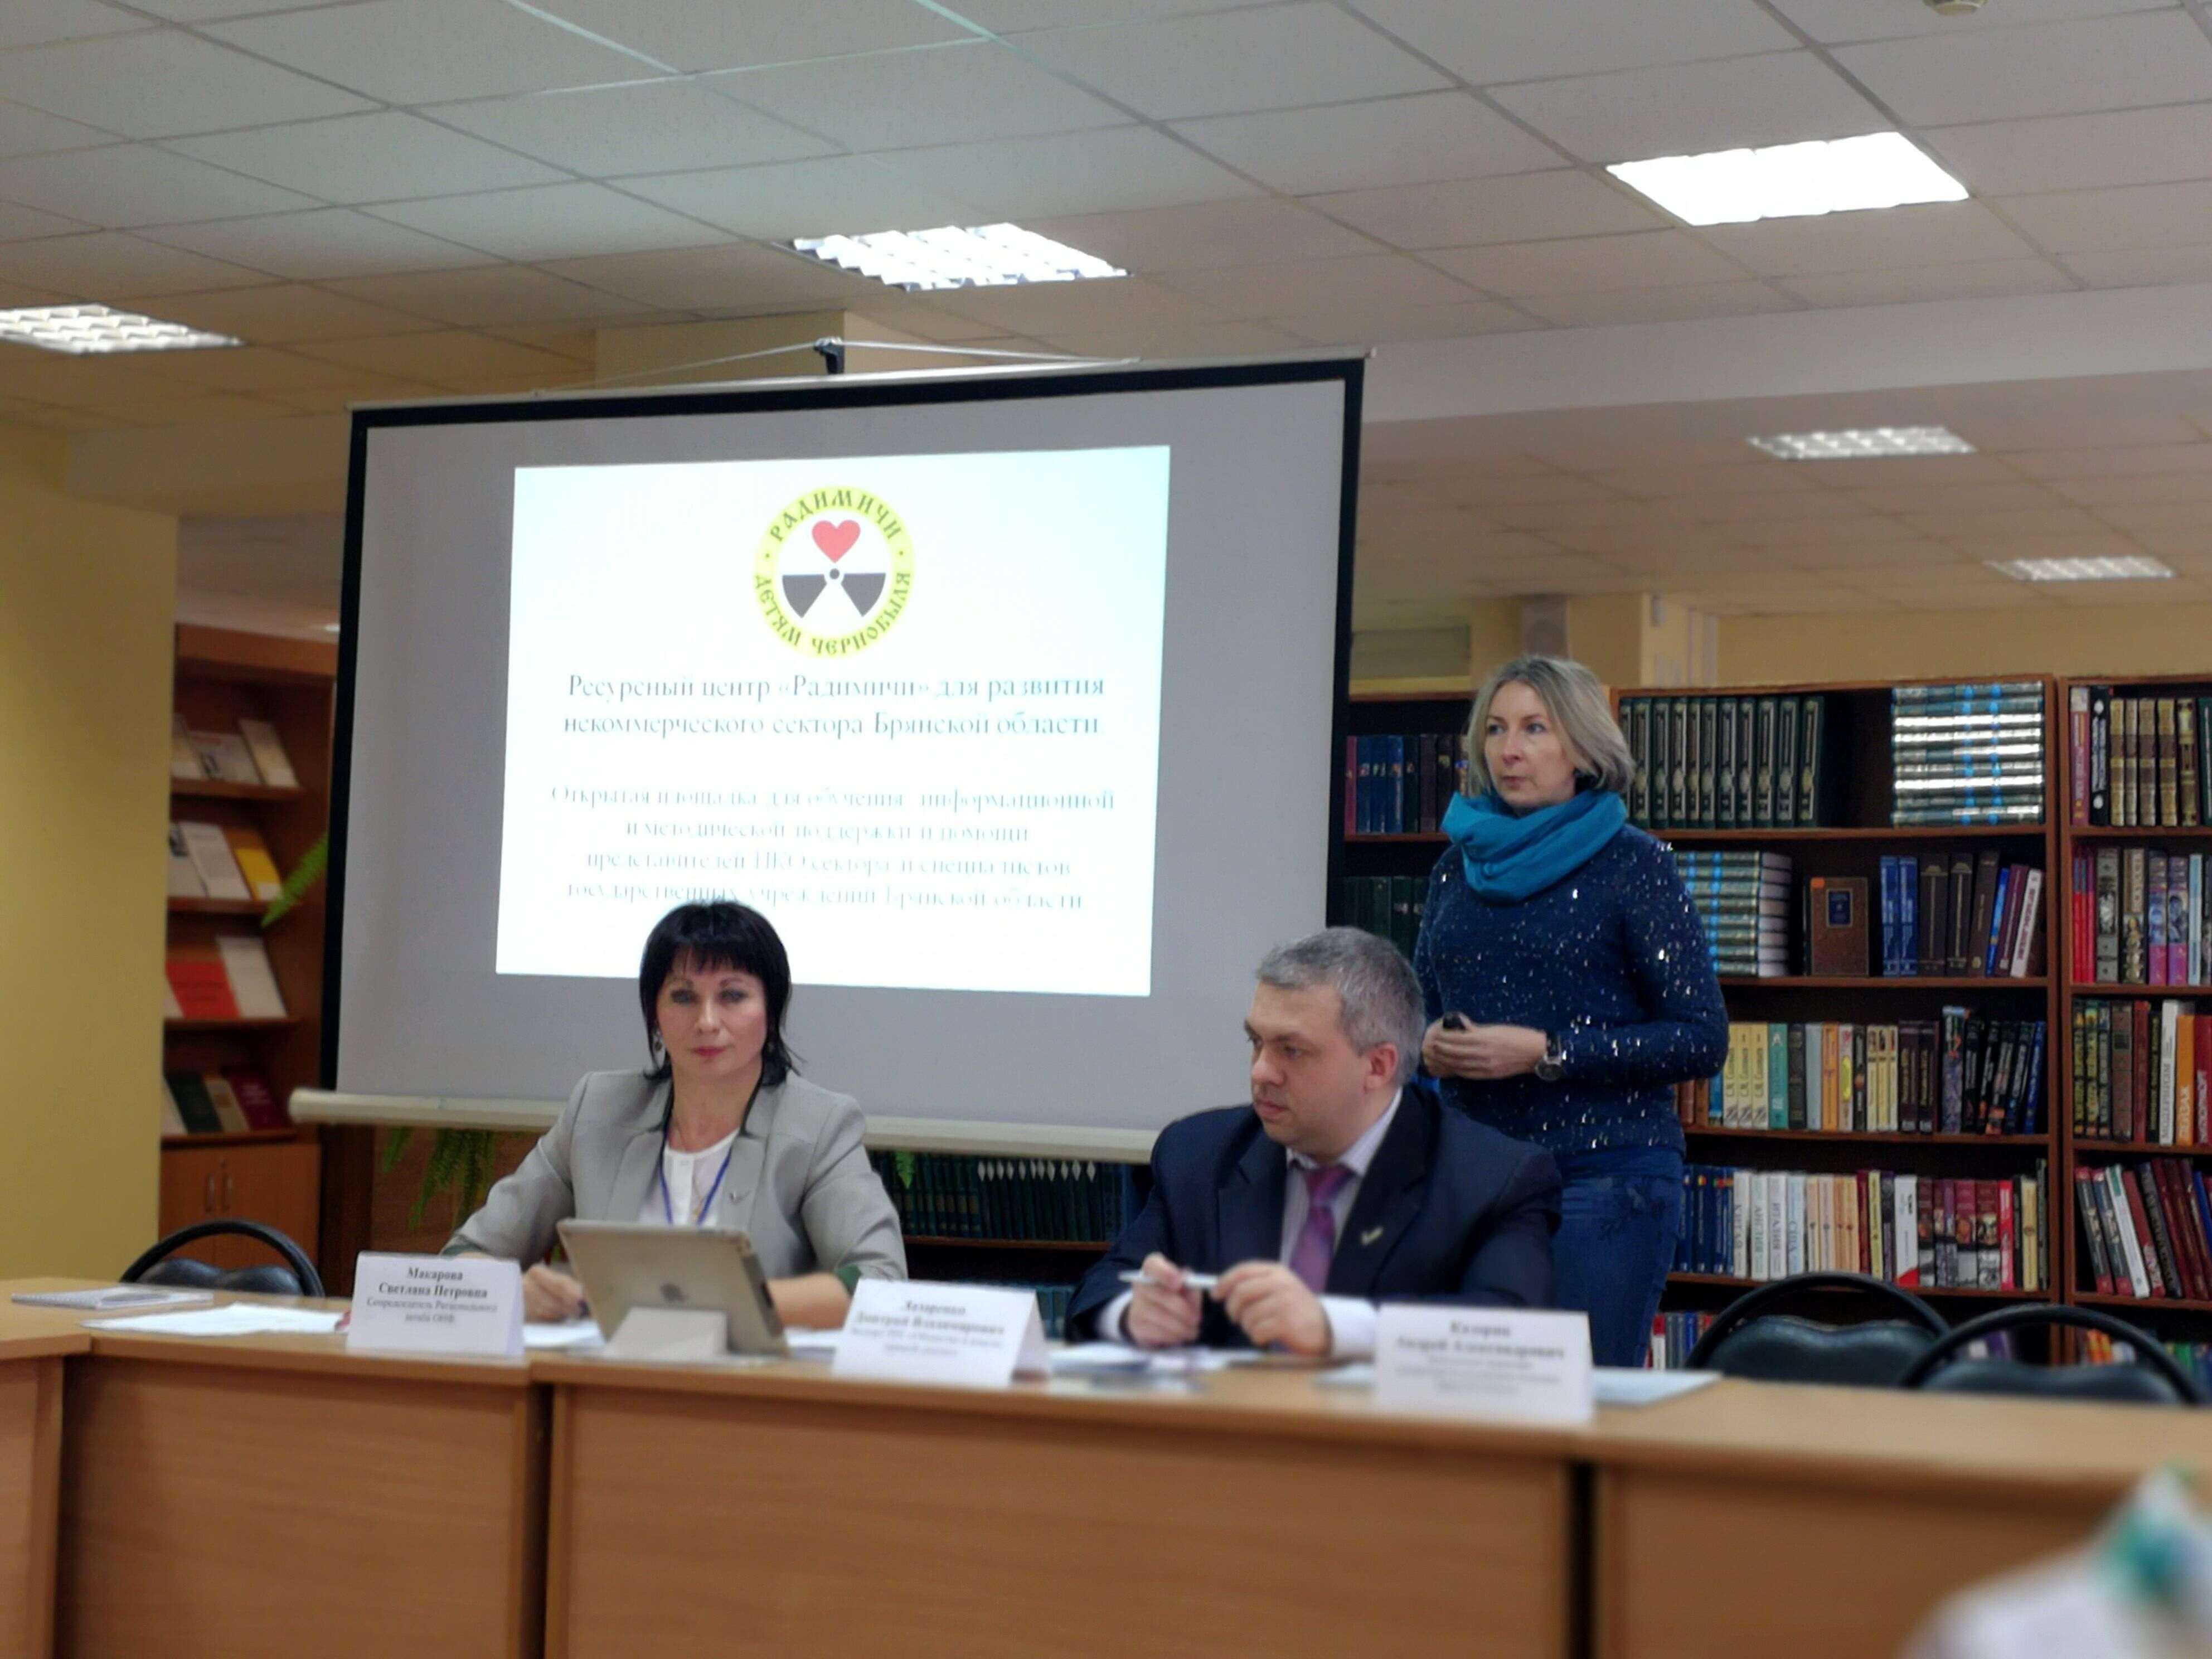 Презентация проекта «Ресурсный центр «Радимичи»